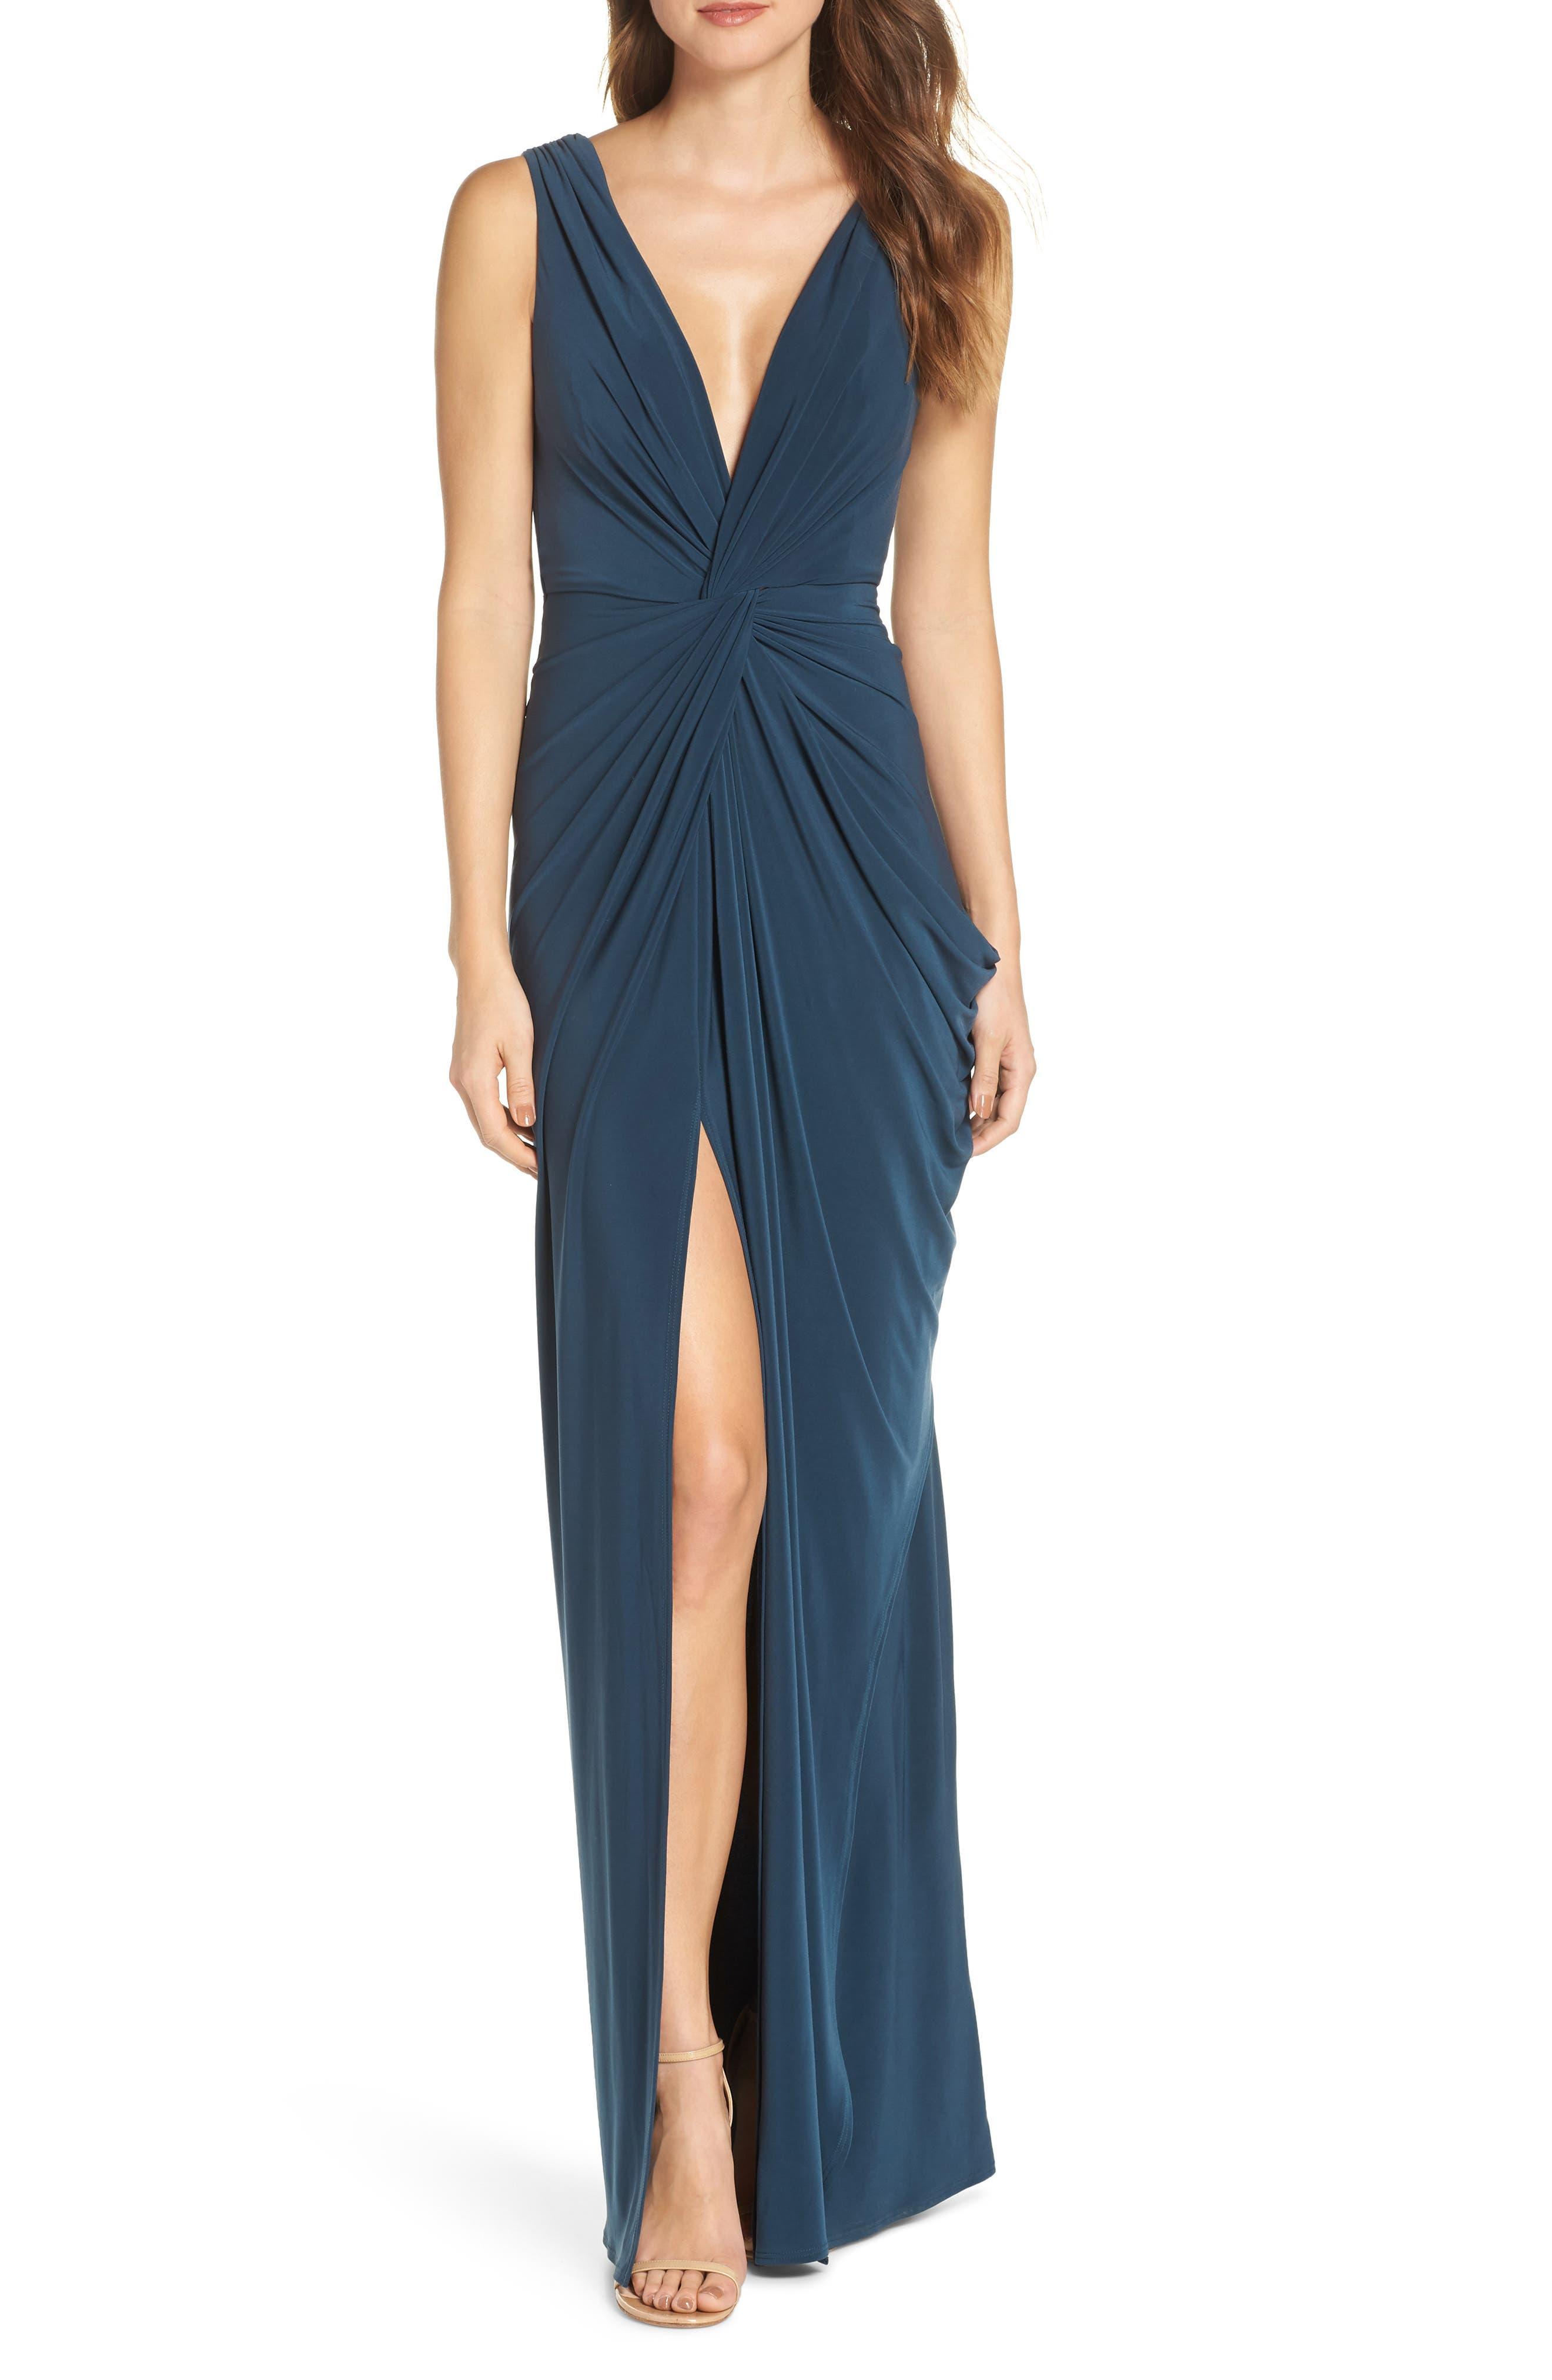 Katie May Leo Twist Front Evening Dress, Blue